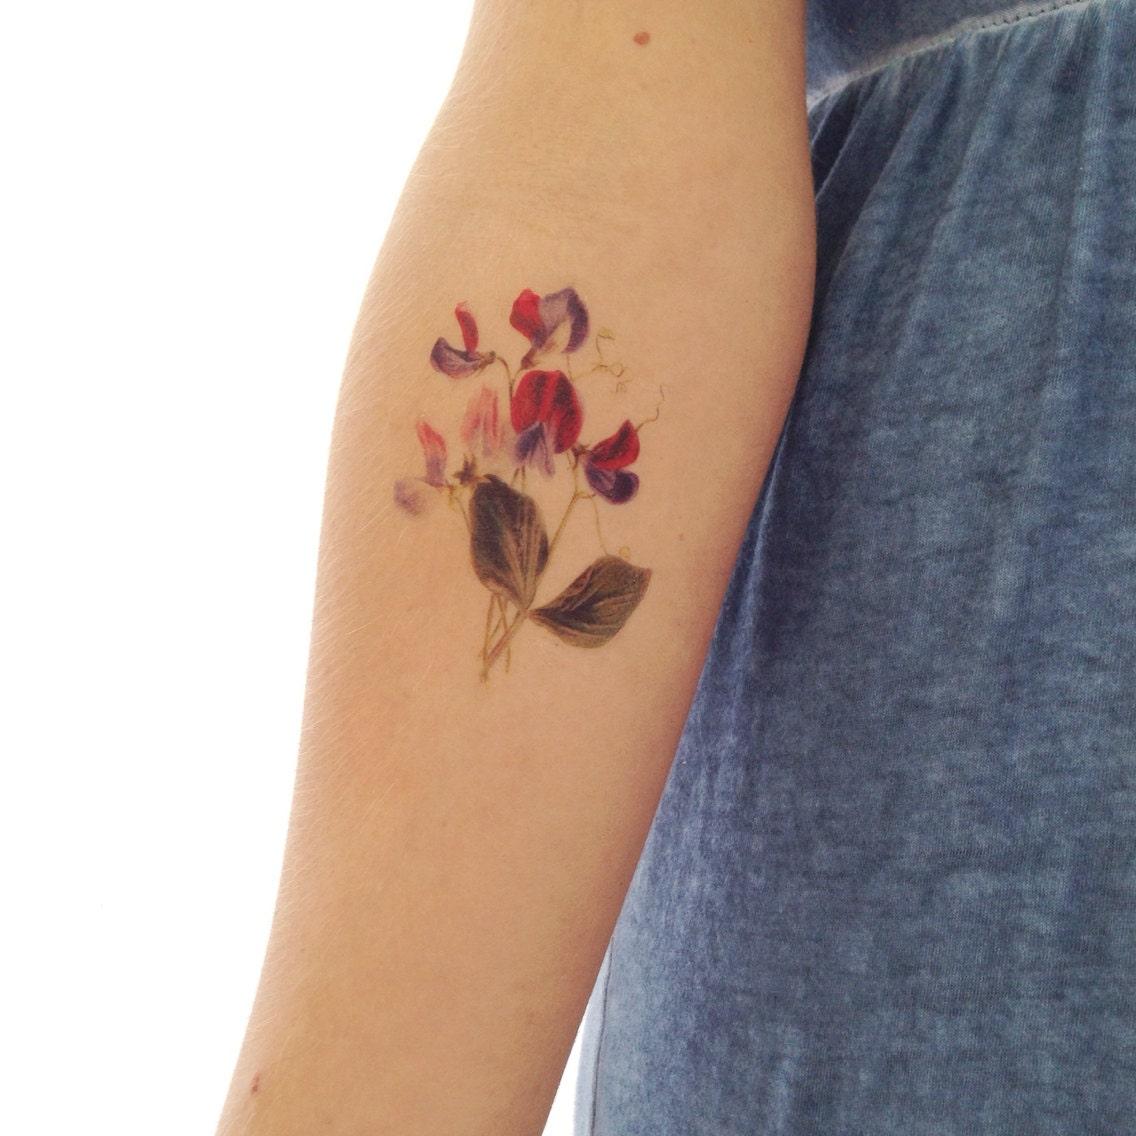 Tattoo 39 s i like on pinterest sweet peas a tattoo and for Sweet pea tattoo